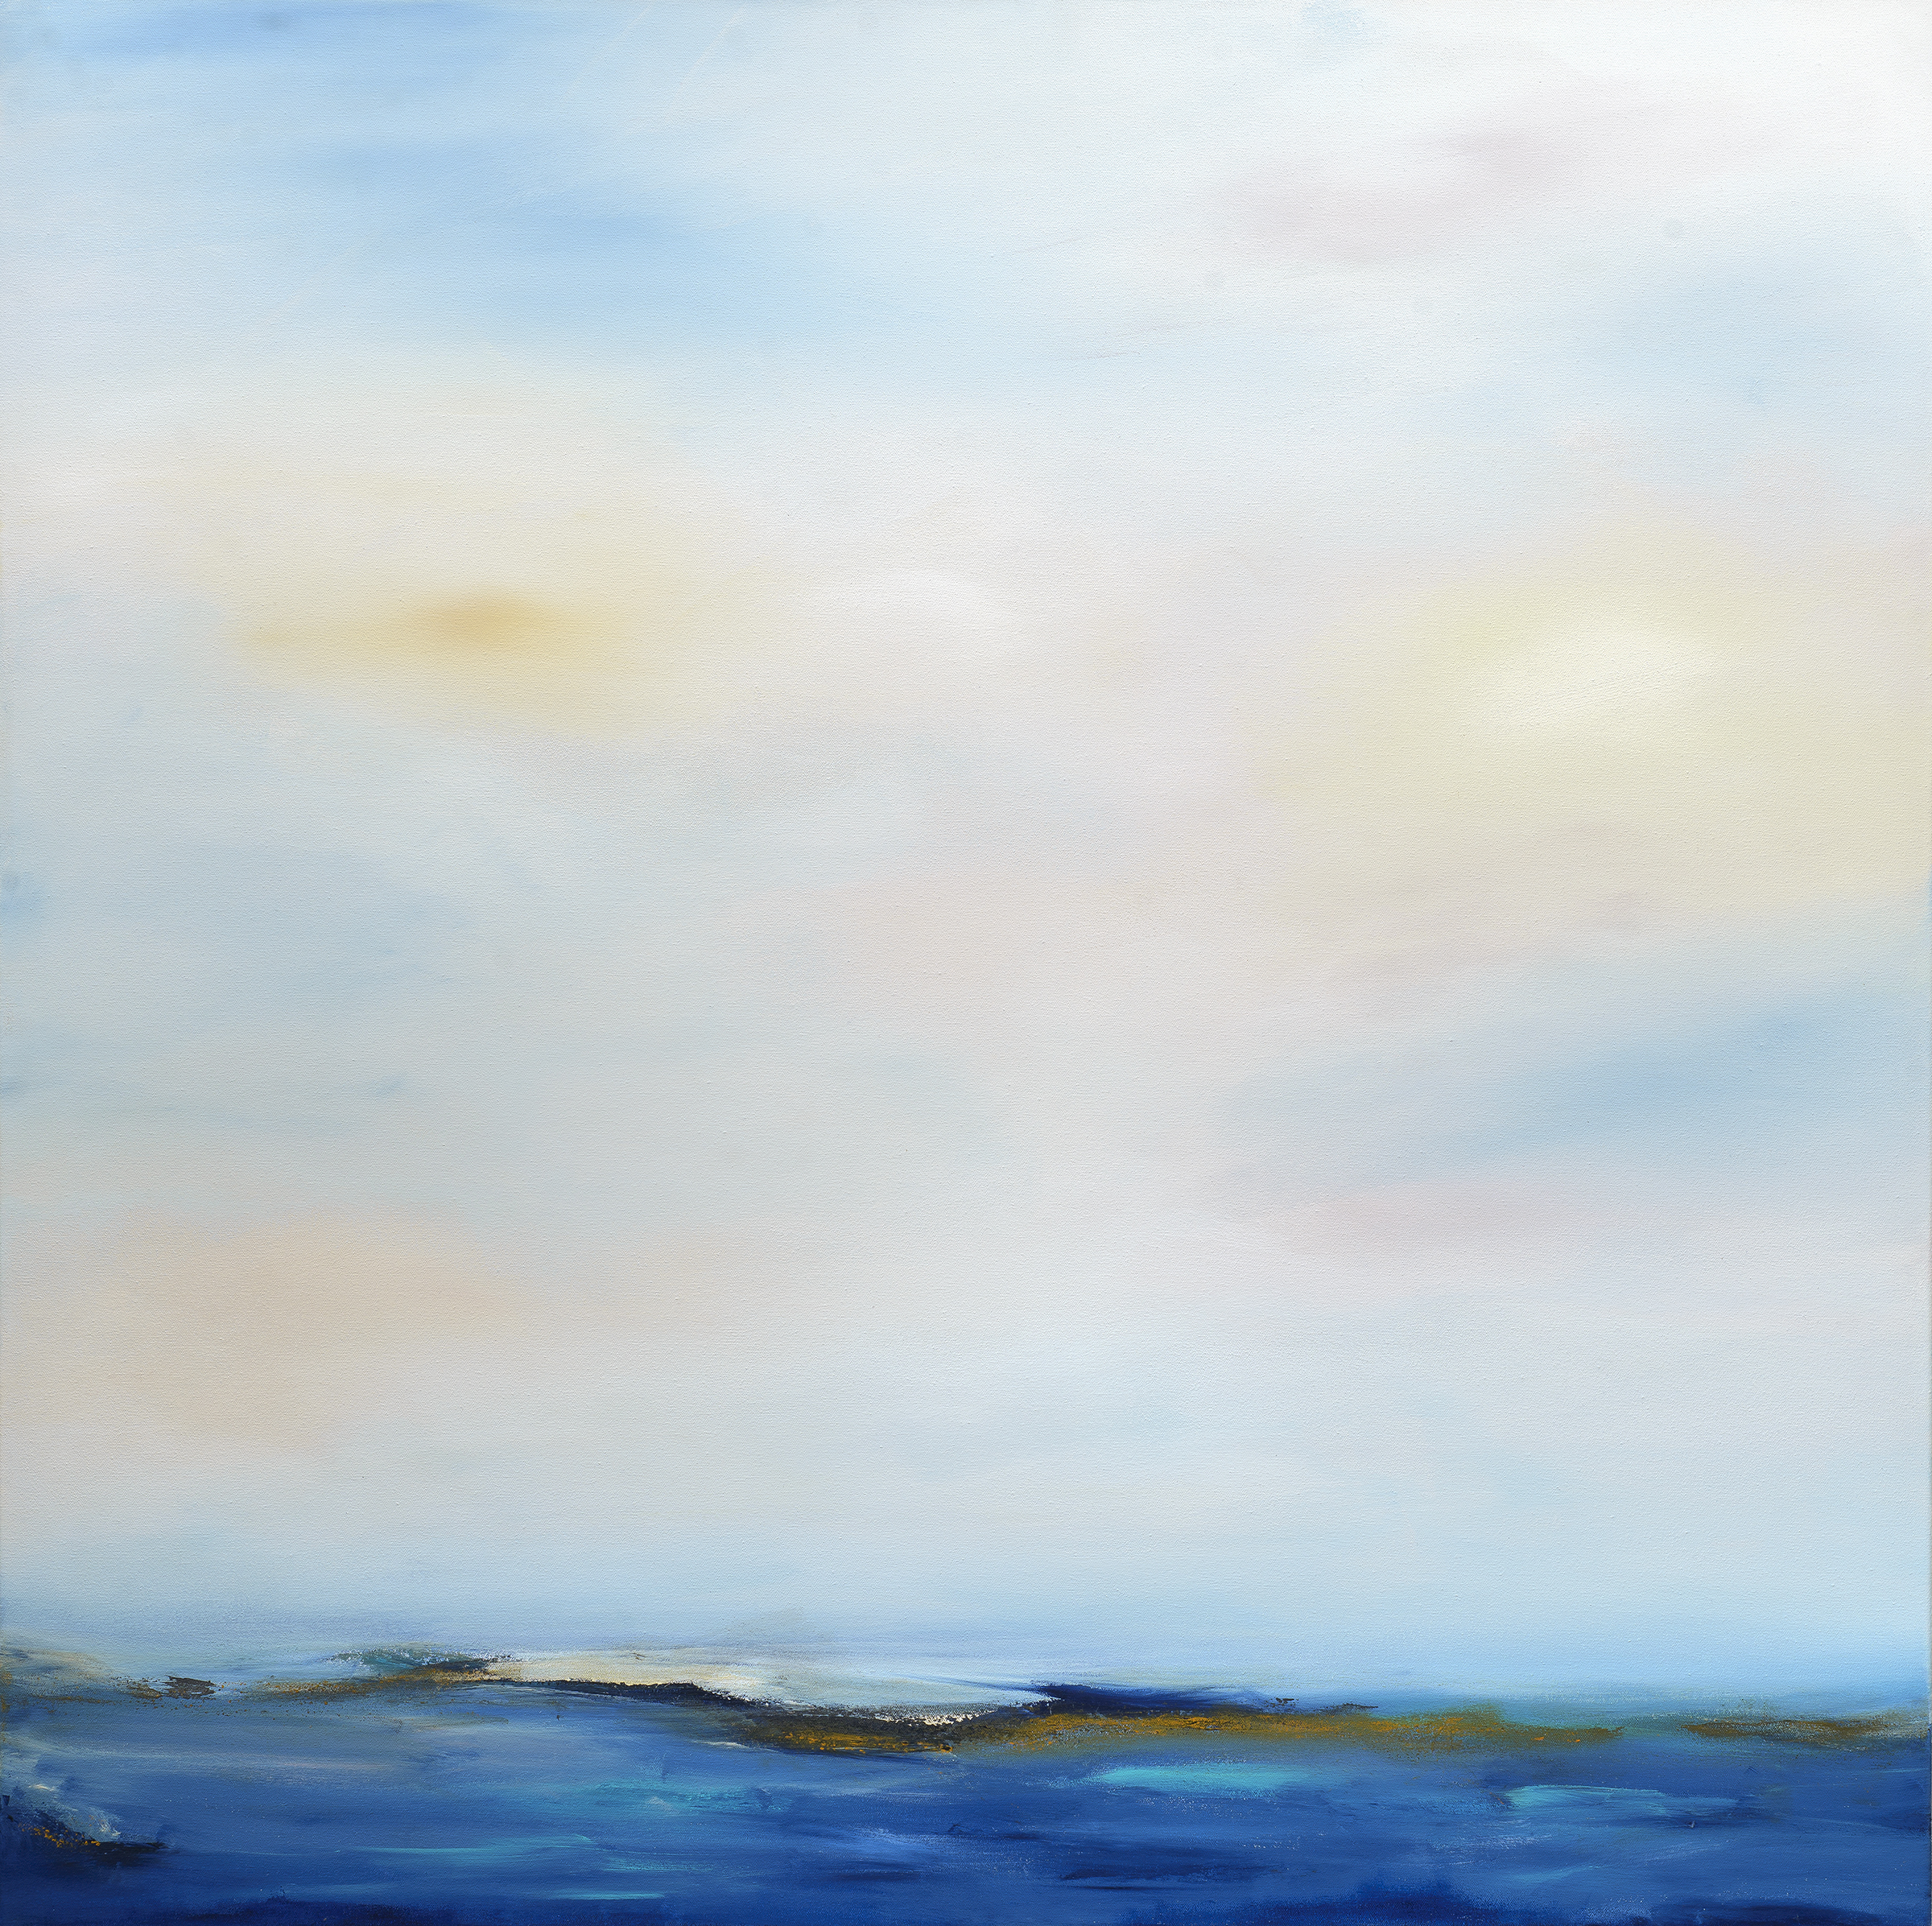 """Carmel Point River Mouth"" - 40 x 40"" - Sold - Carmel, CA"